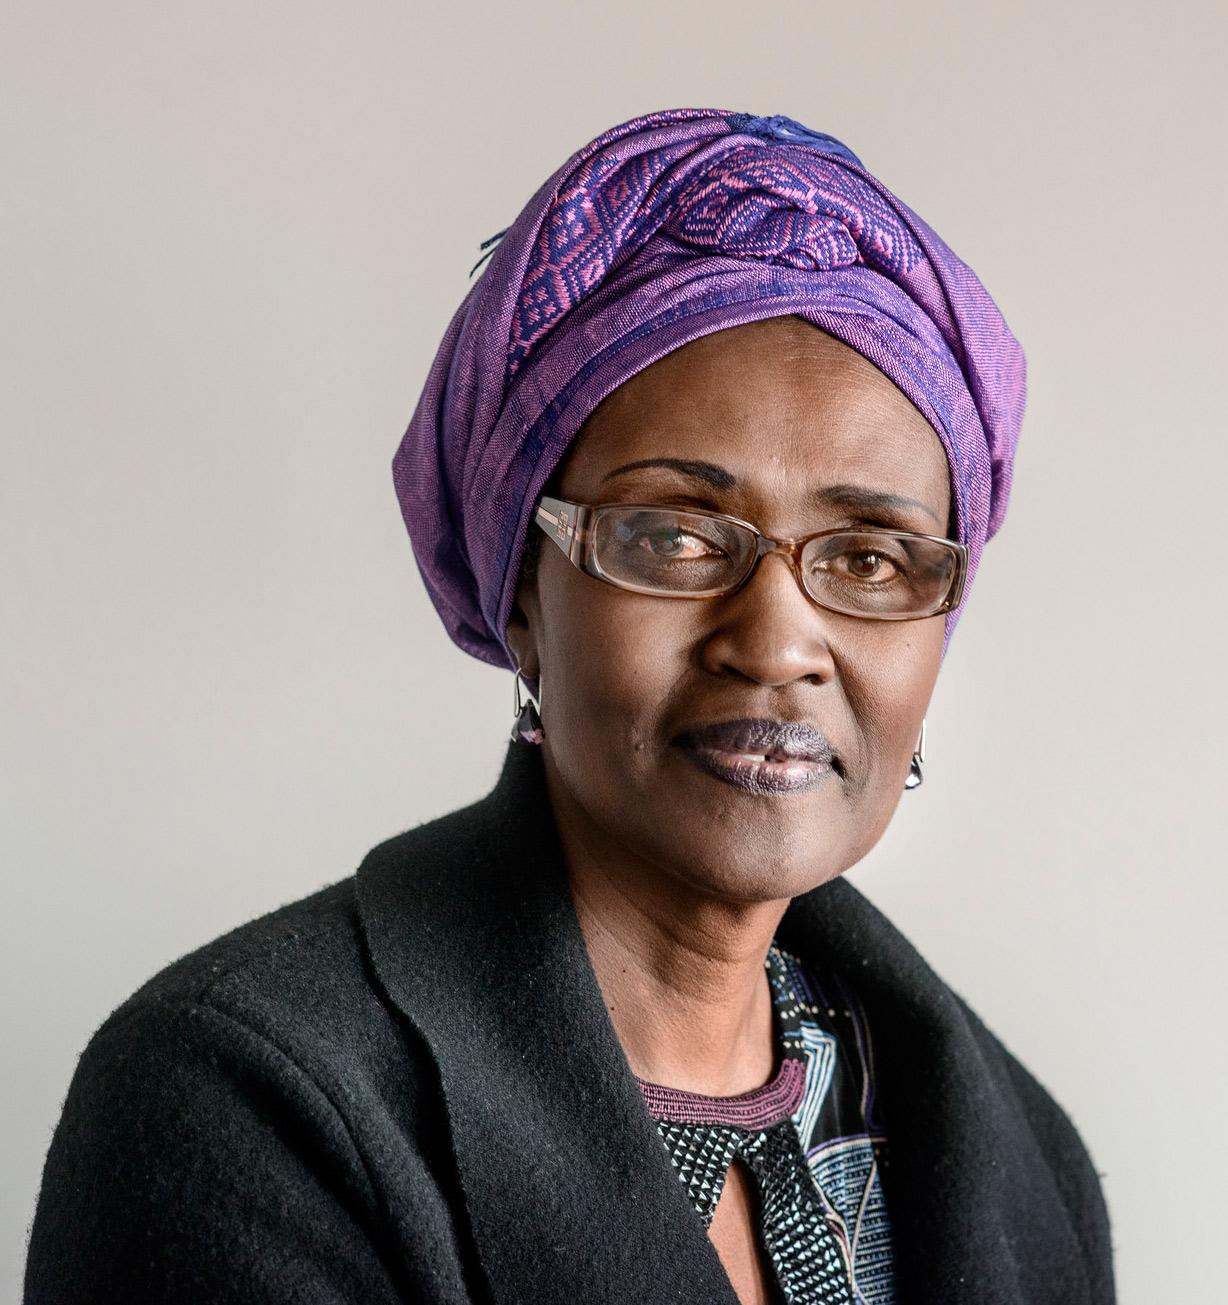 Oxfam International Executive Director, Winnie Byanyima